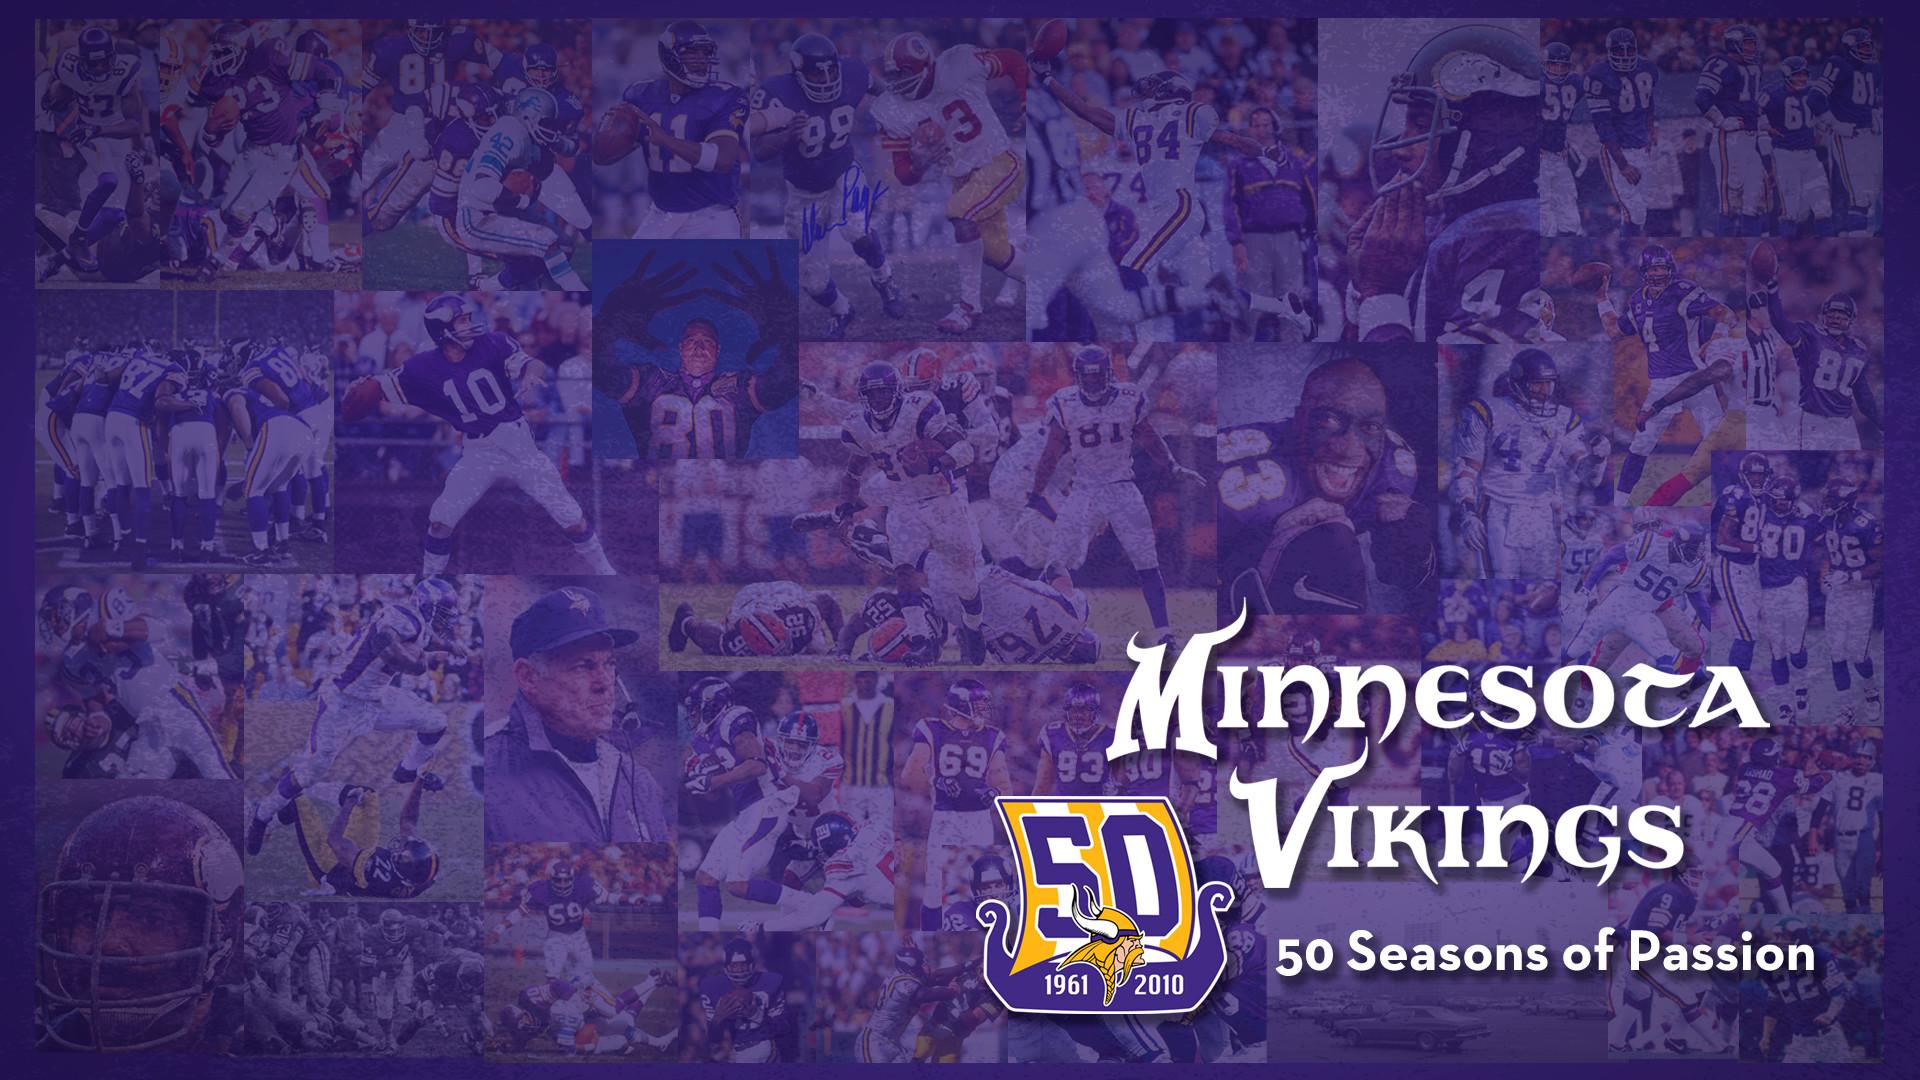 Res: 1920x1080, Minnesota Vikings Logo Wide Wallpaper 1280X800 04 26 2011 Vikings